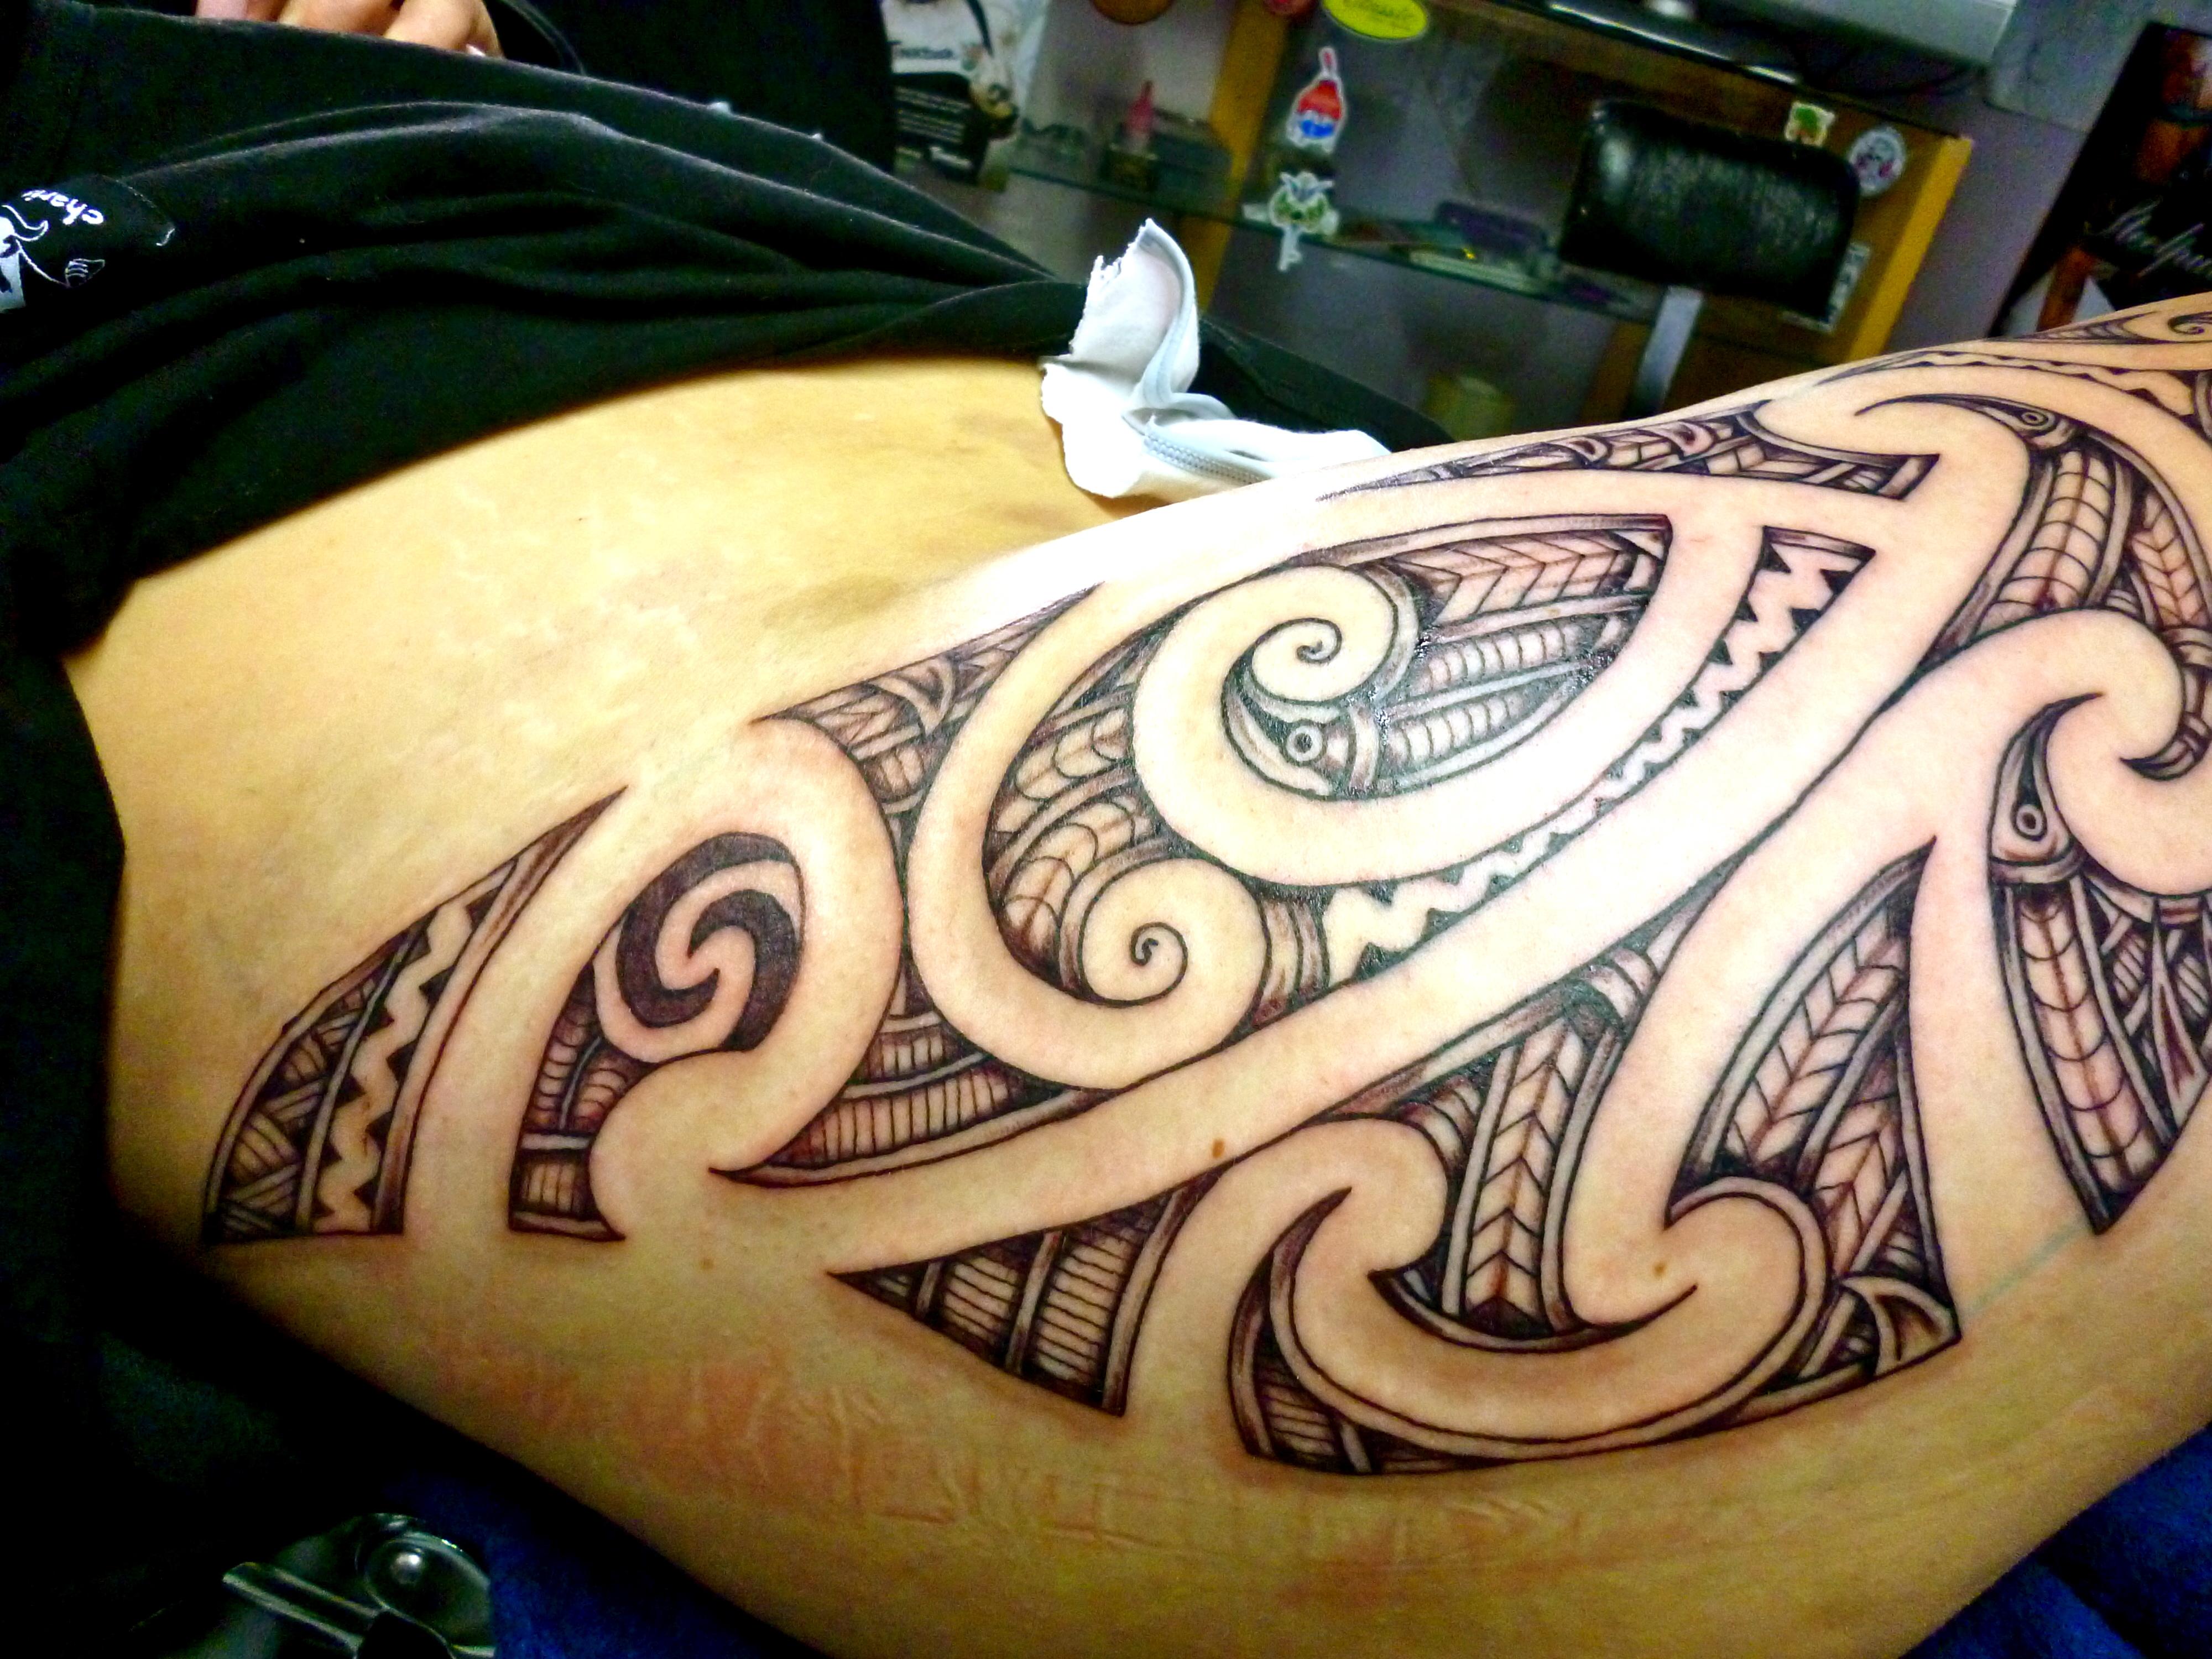 784856bce Nz Maori Styled Kirituhi Design Thigh